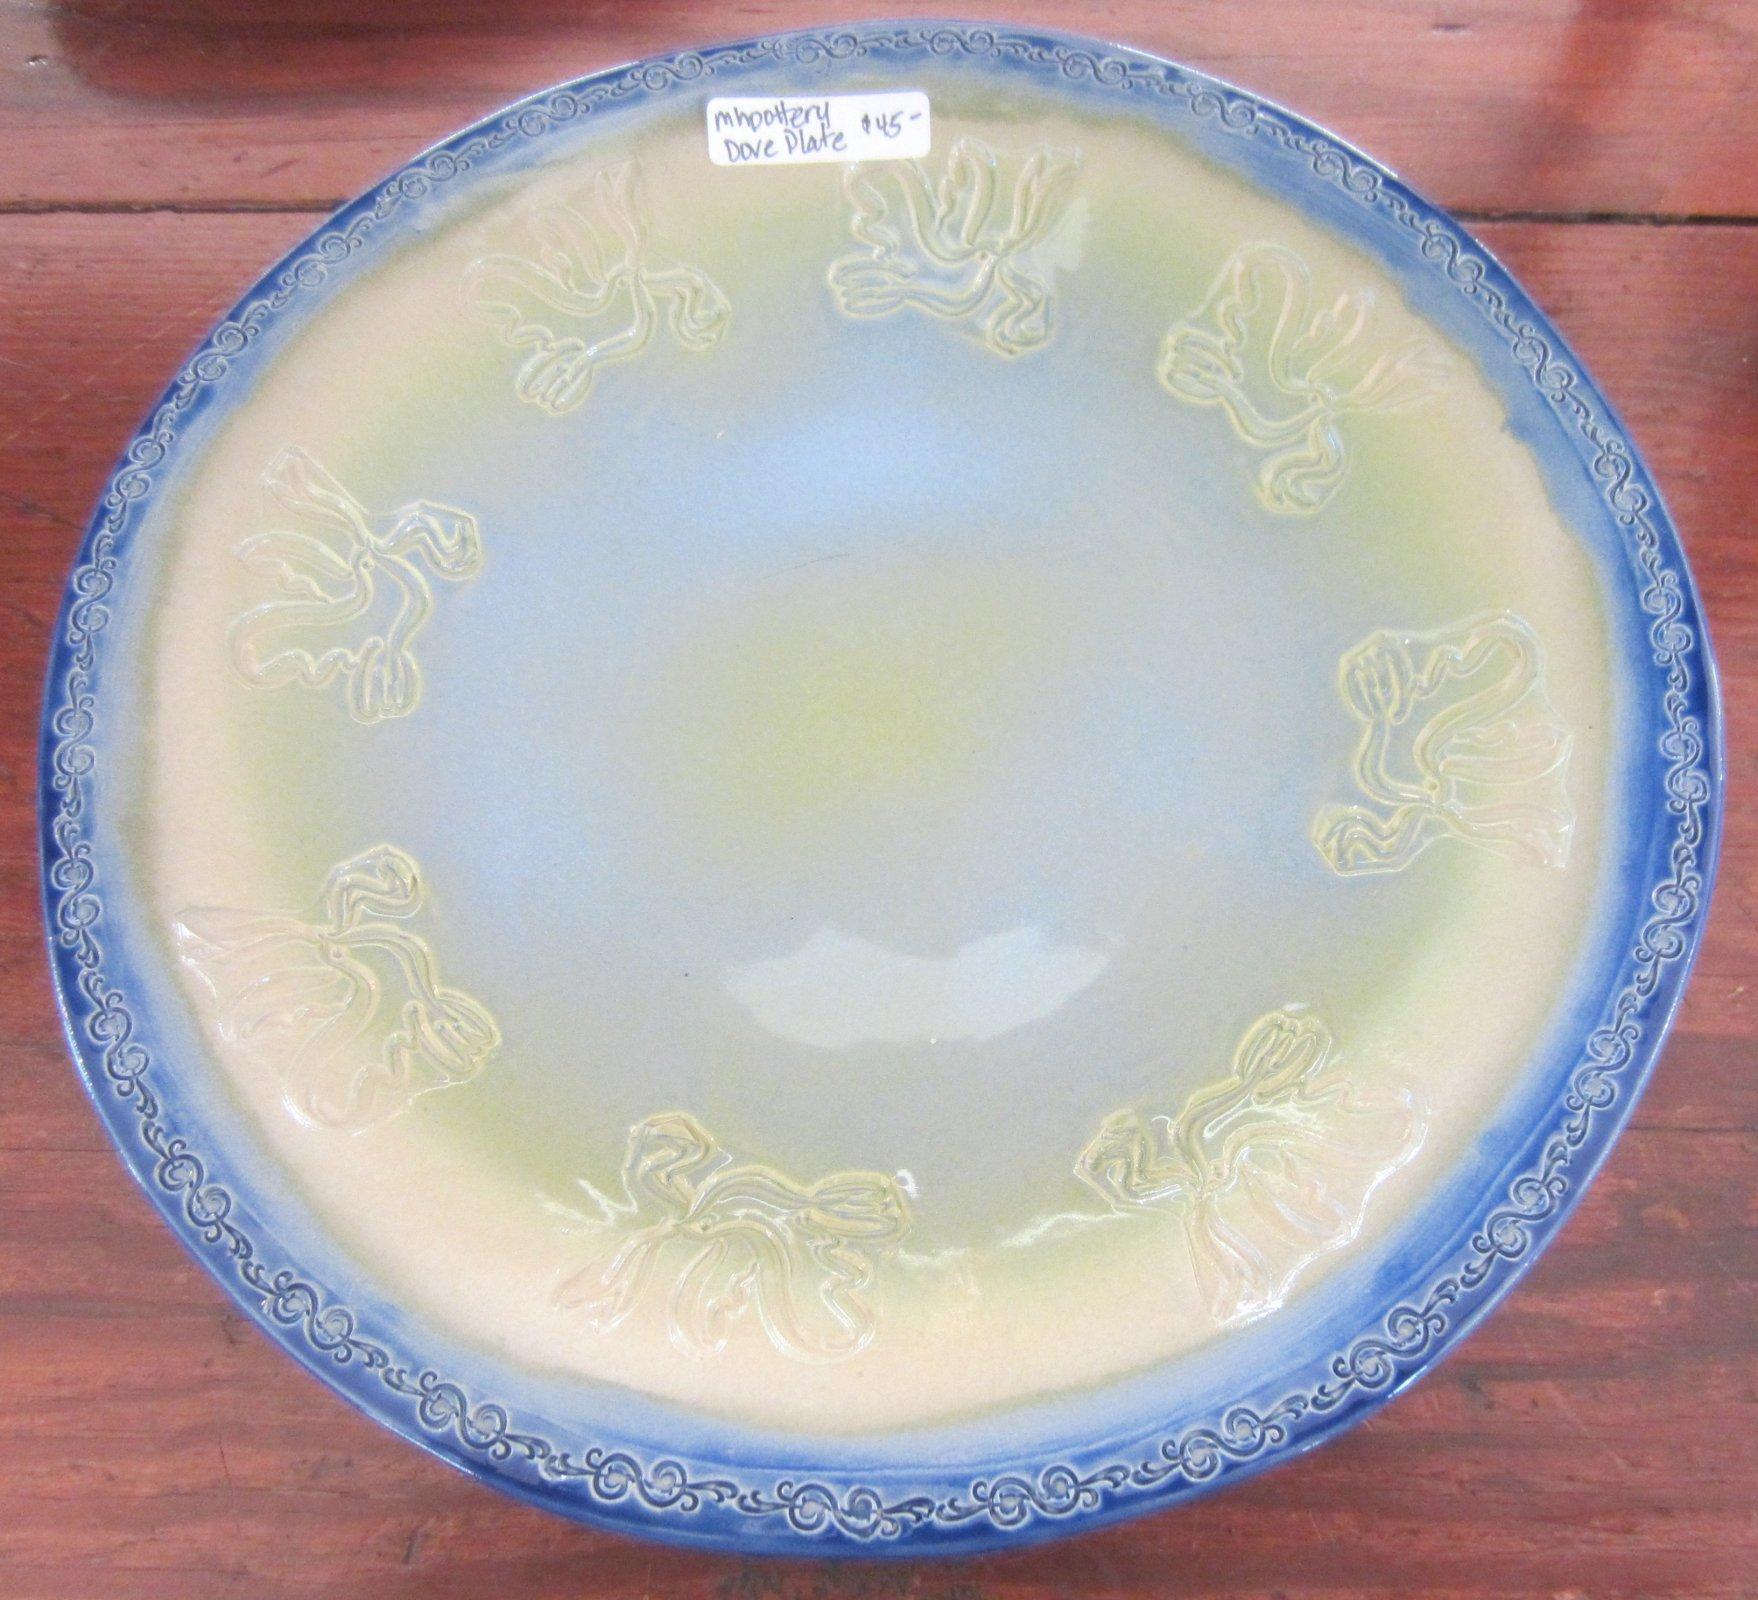 Dove Plate Blue and Cream